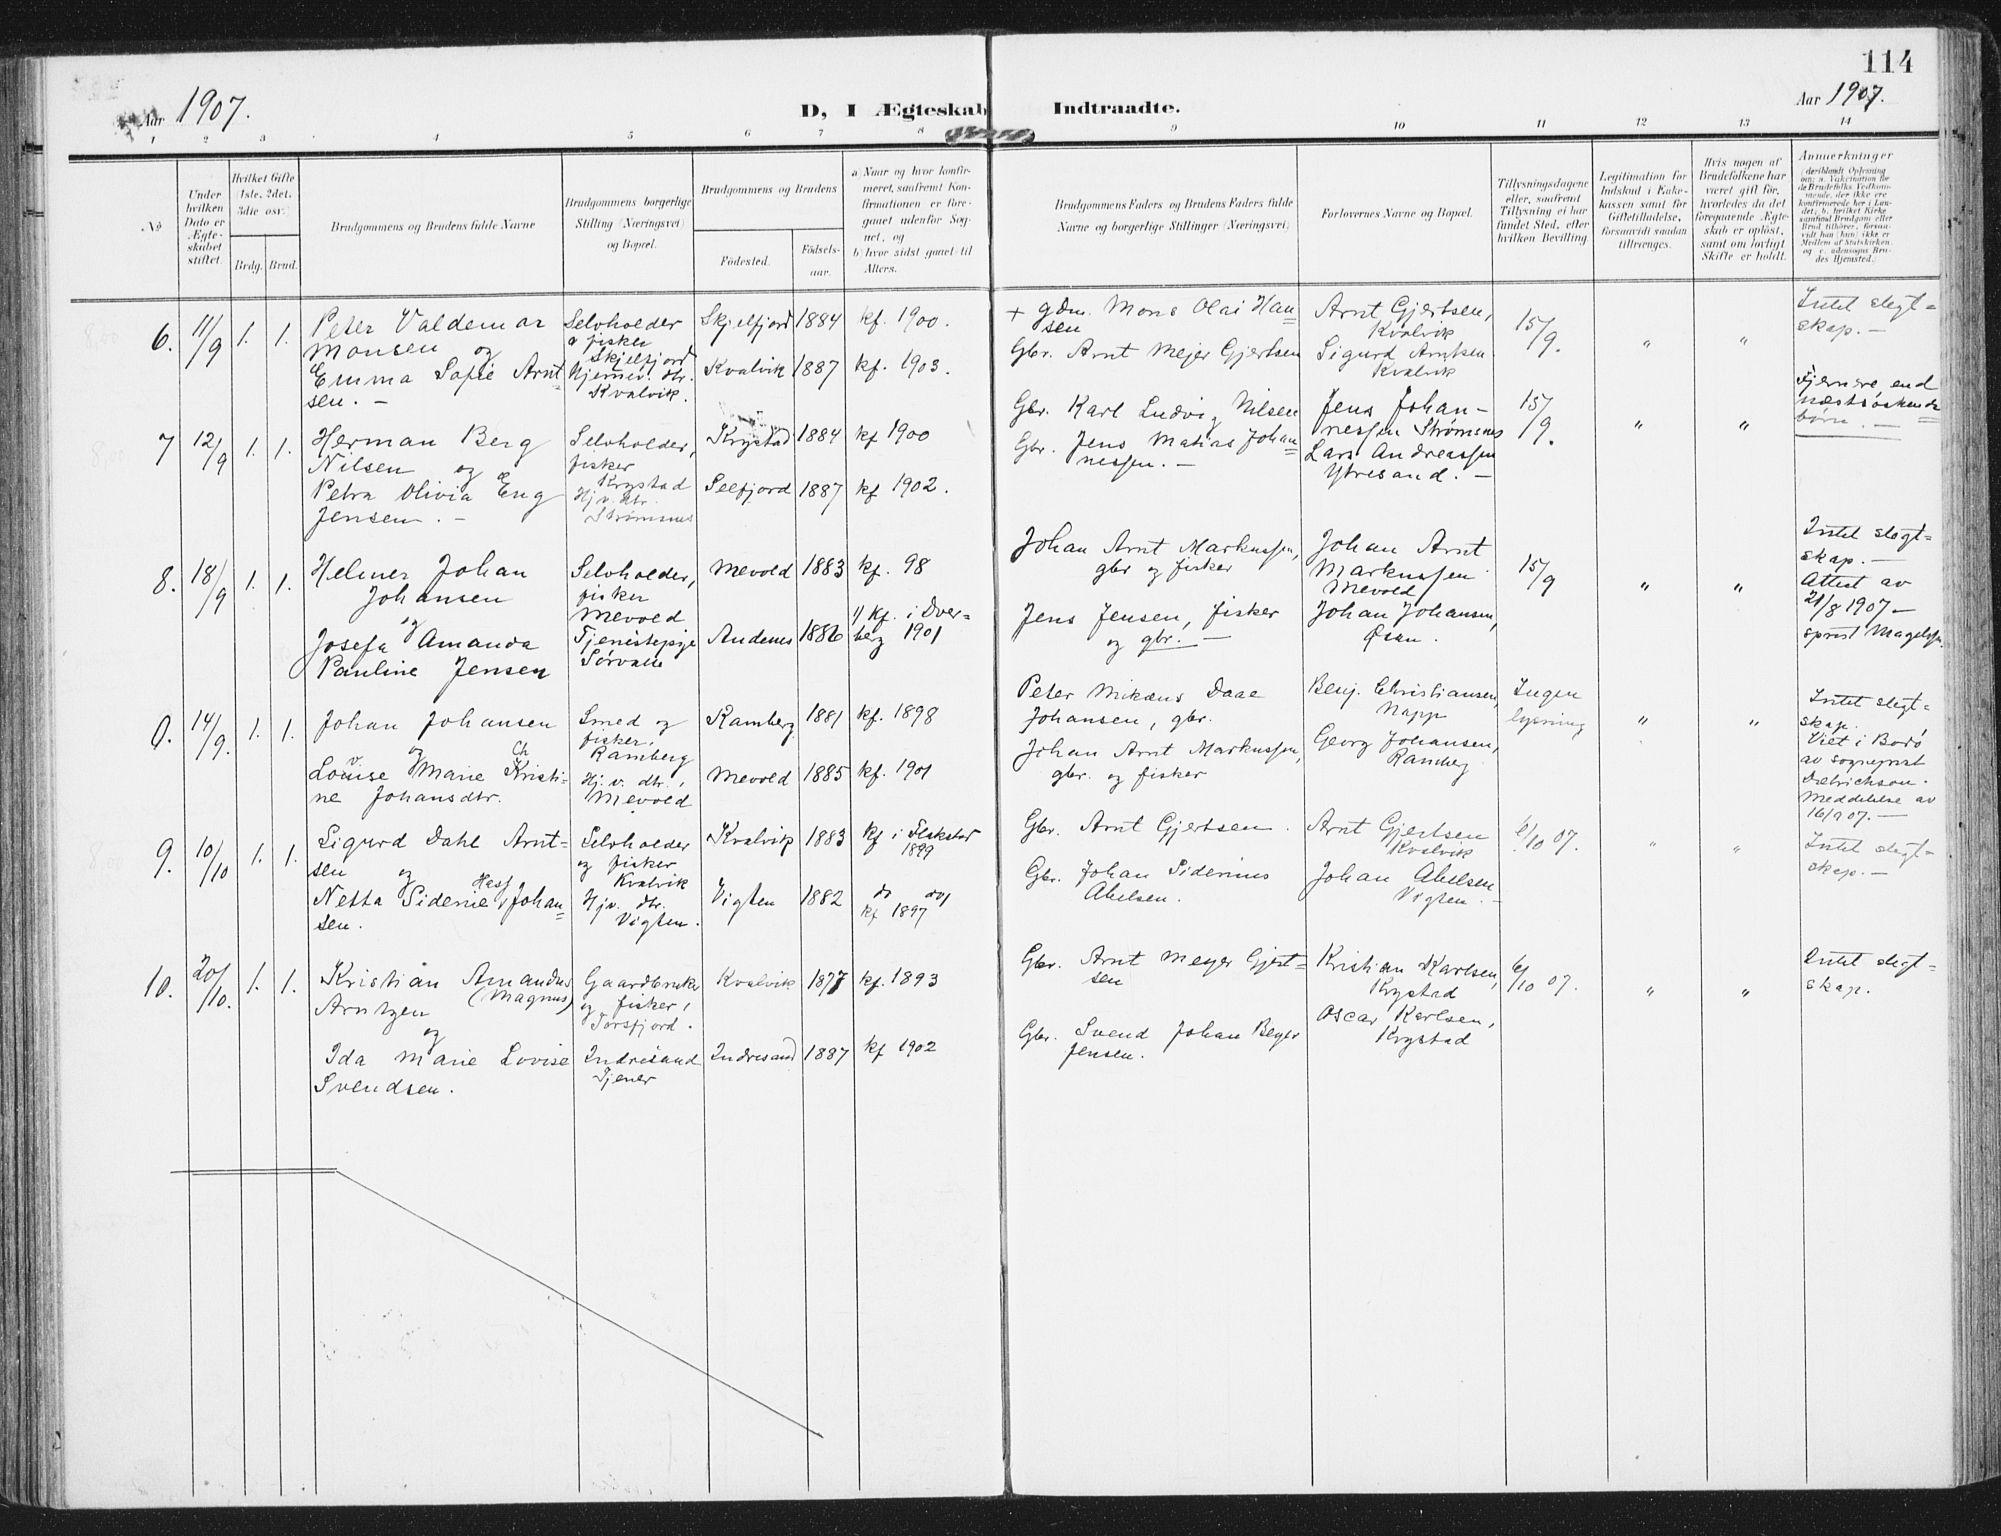 SAT, Ministerialprotokoller, klokkerbøker og fødselsregistre - Nordland, 885/L1206: Ministerialbok nr. 885A07, 1905-1915, s. 114